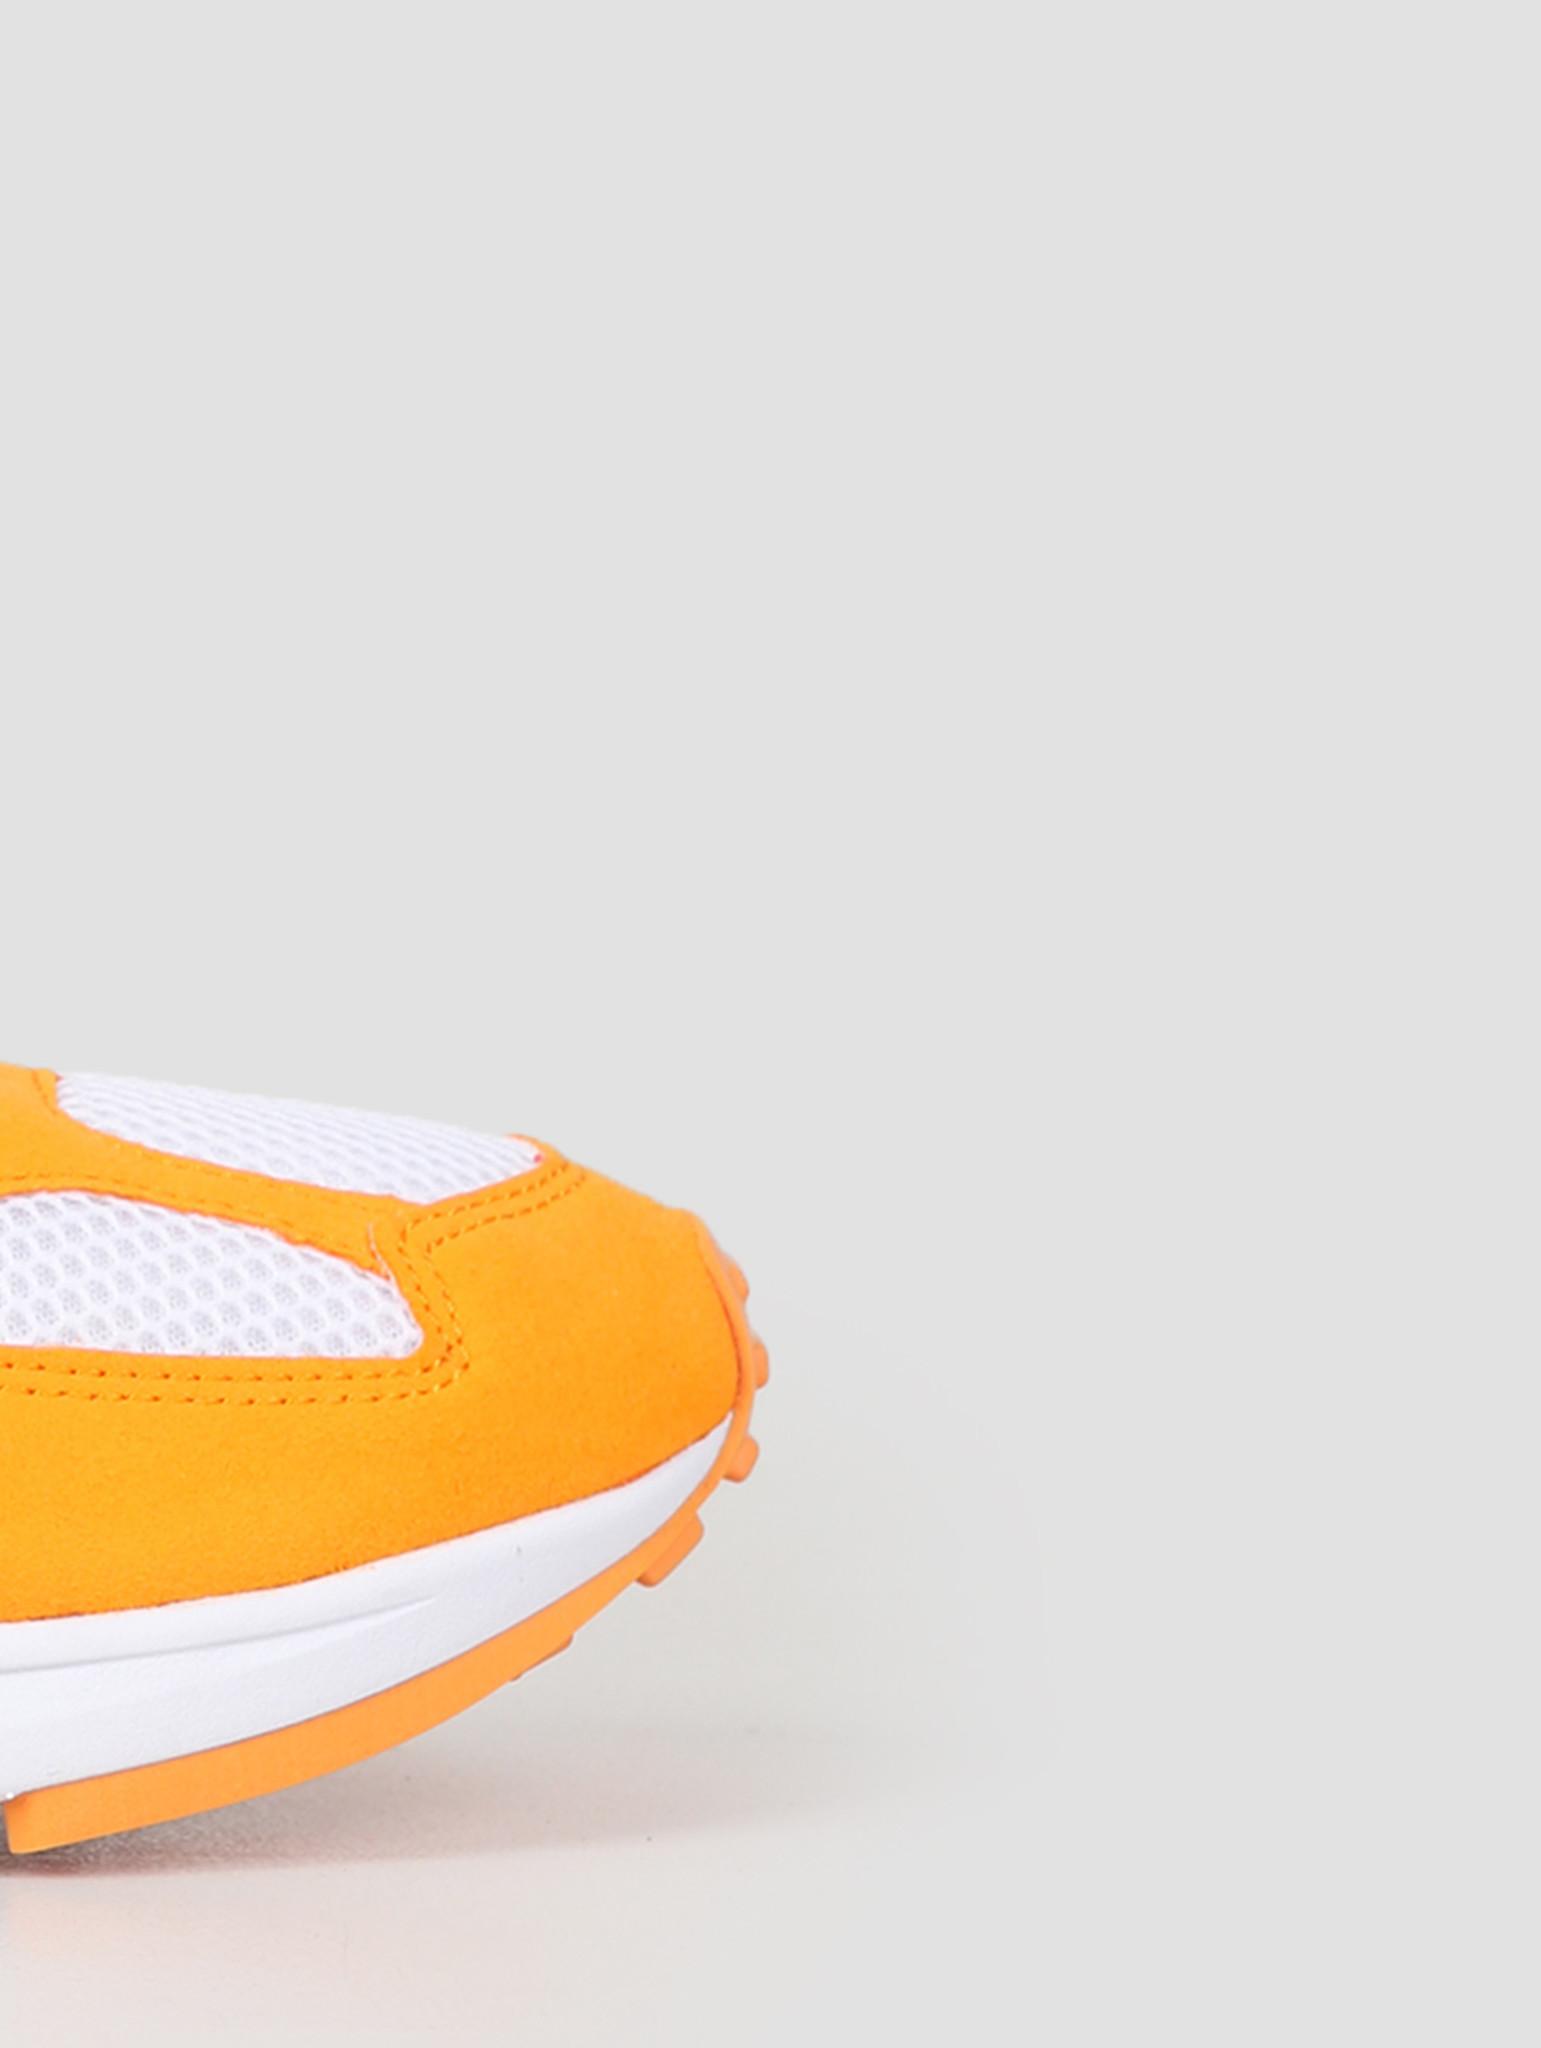 Nike Nike Air Ghost Racer Orange Peel Aphid Green Pure Platinum AT5410 800